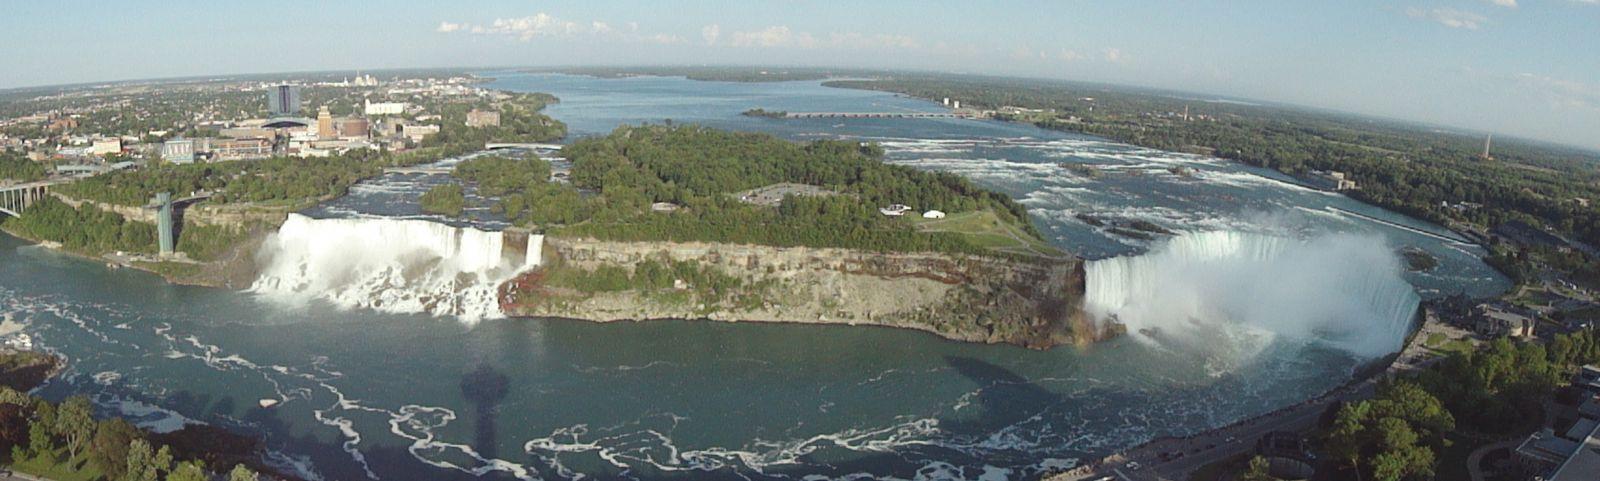 Росперсонал отзывы Канада, Онтарио, Niagara Falls 2